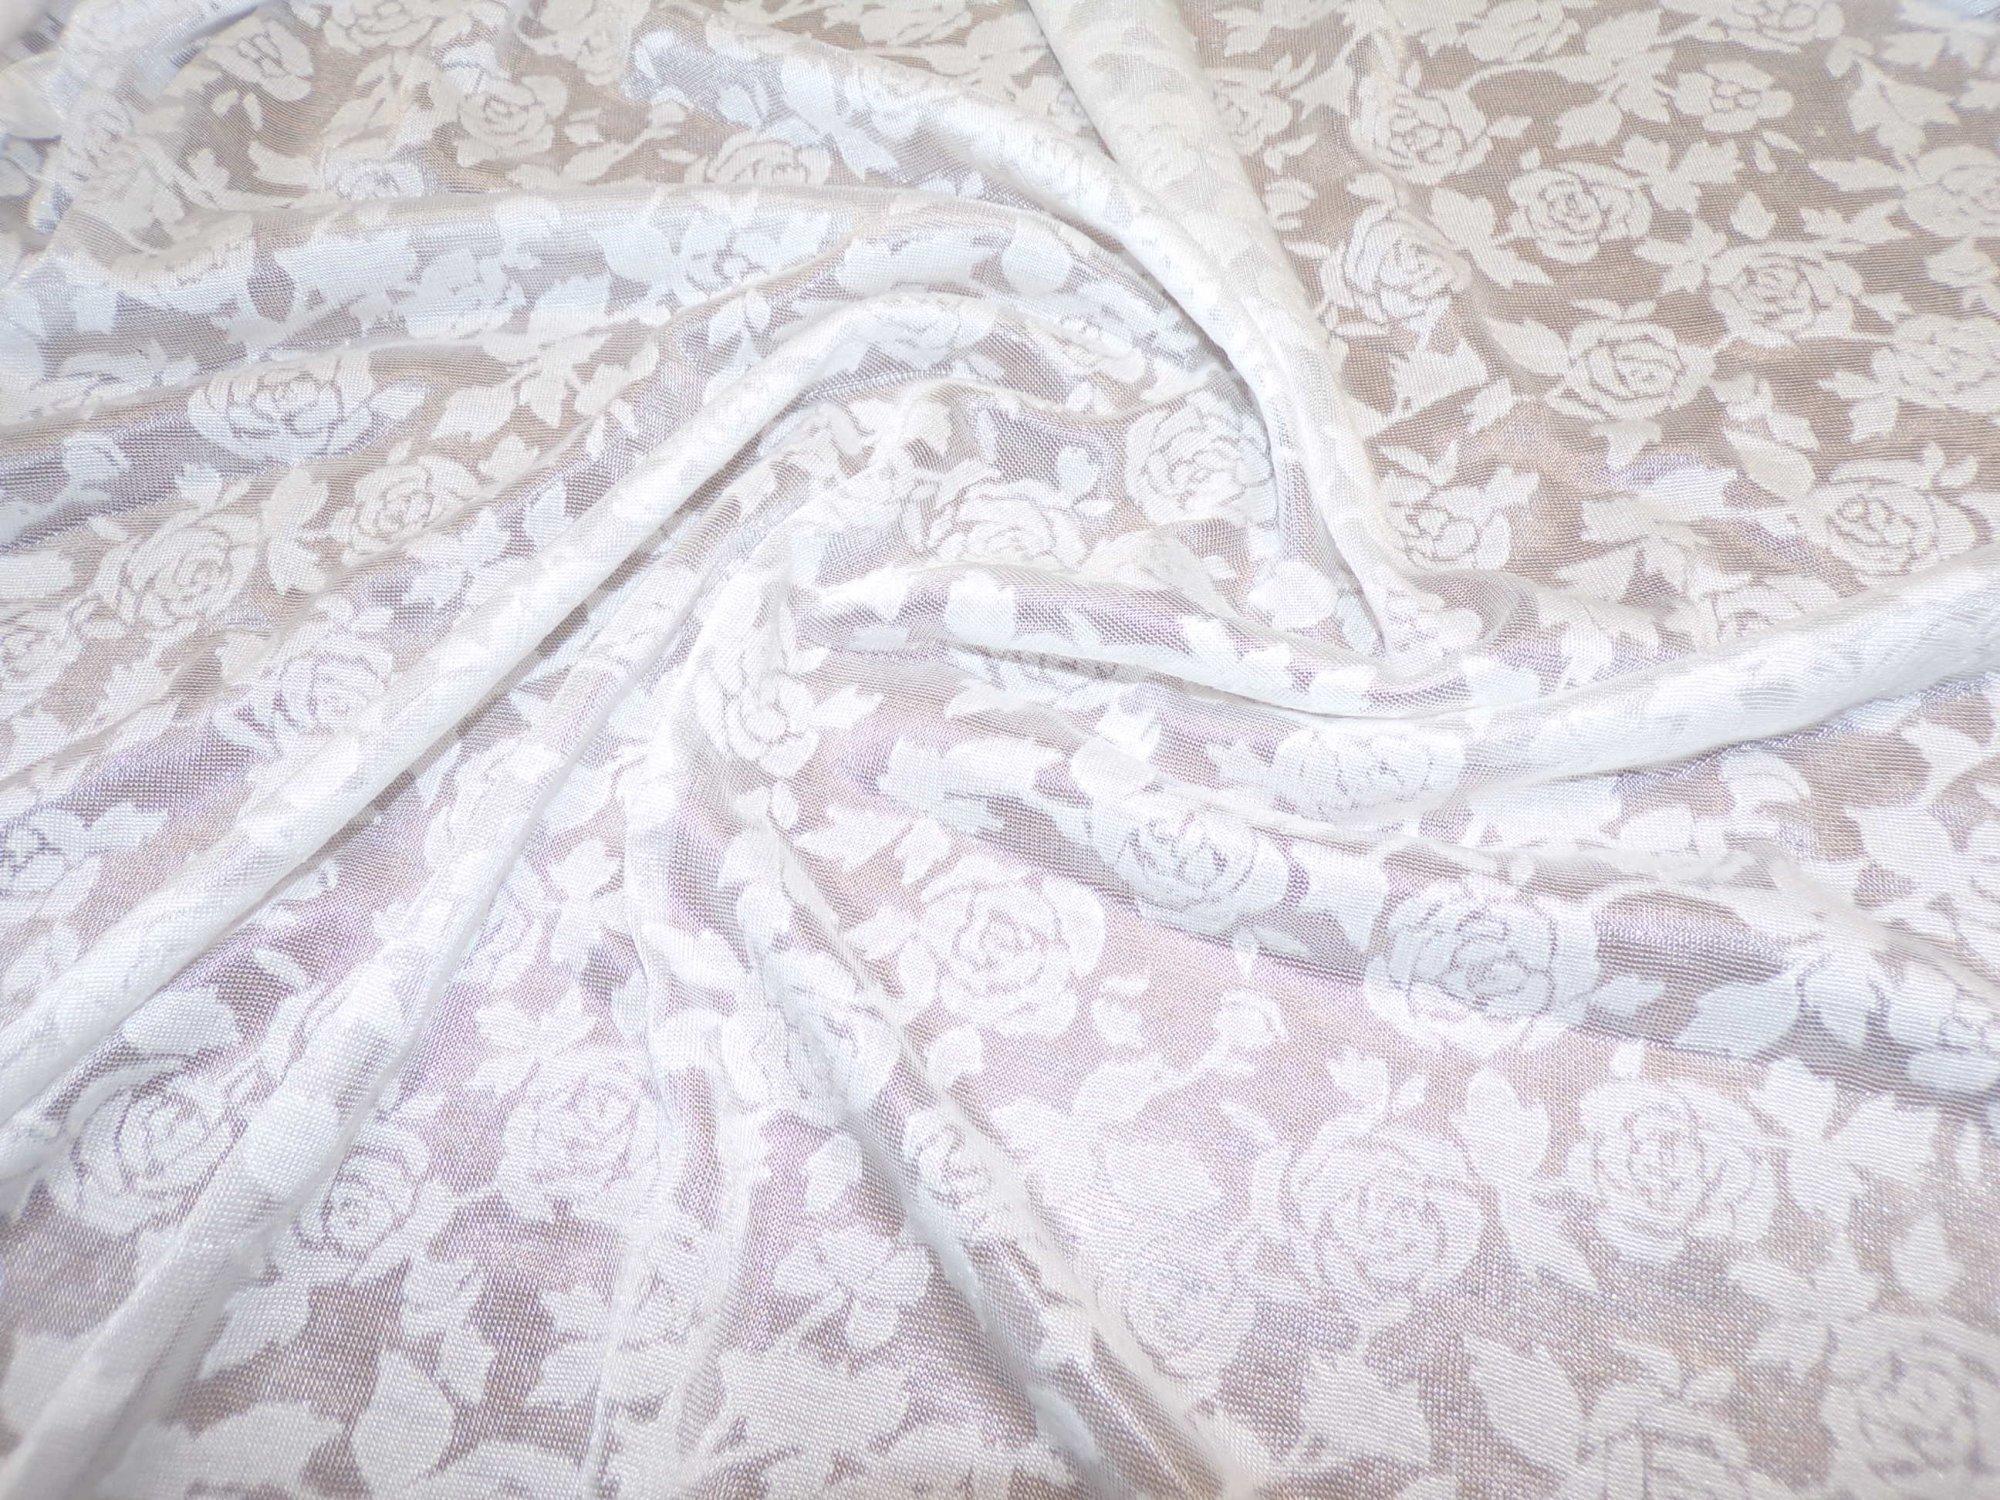 Polyester Rayon Jersey - White Rosebud Burnout